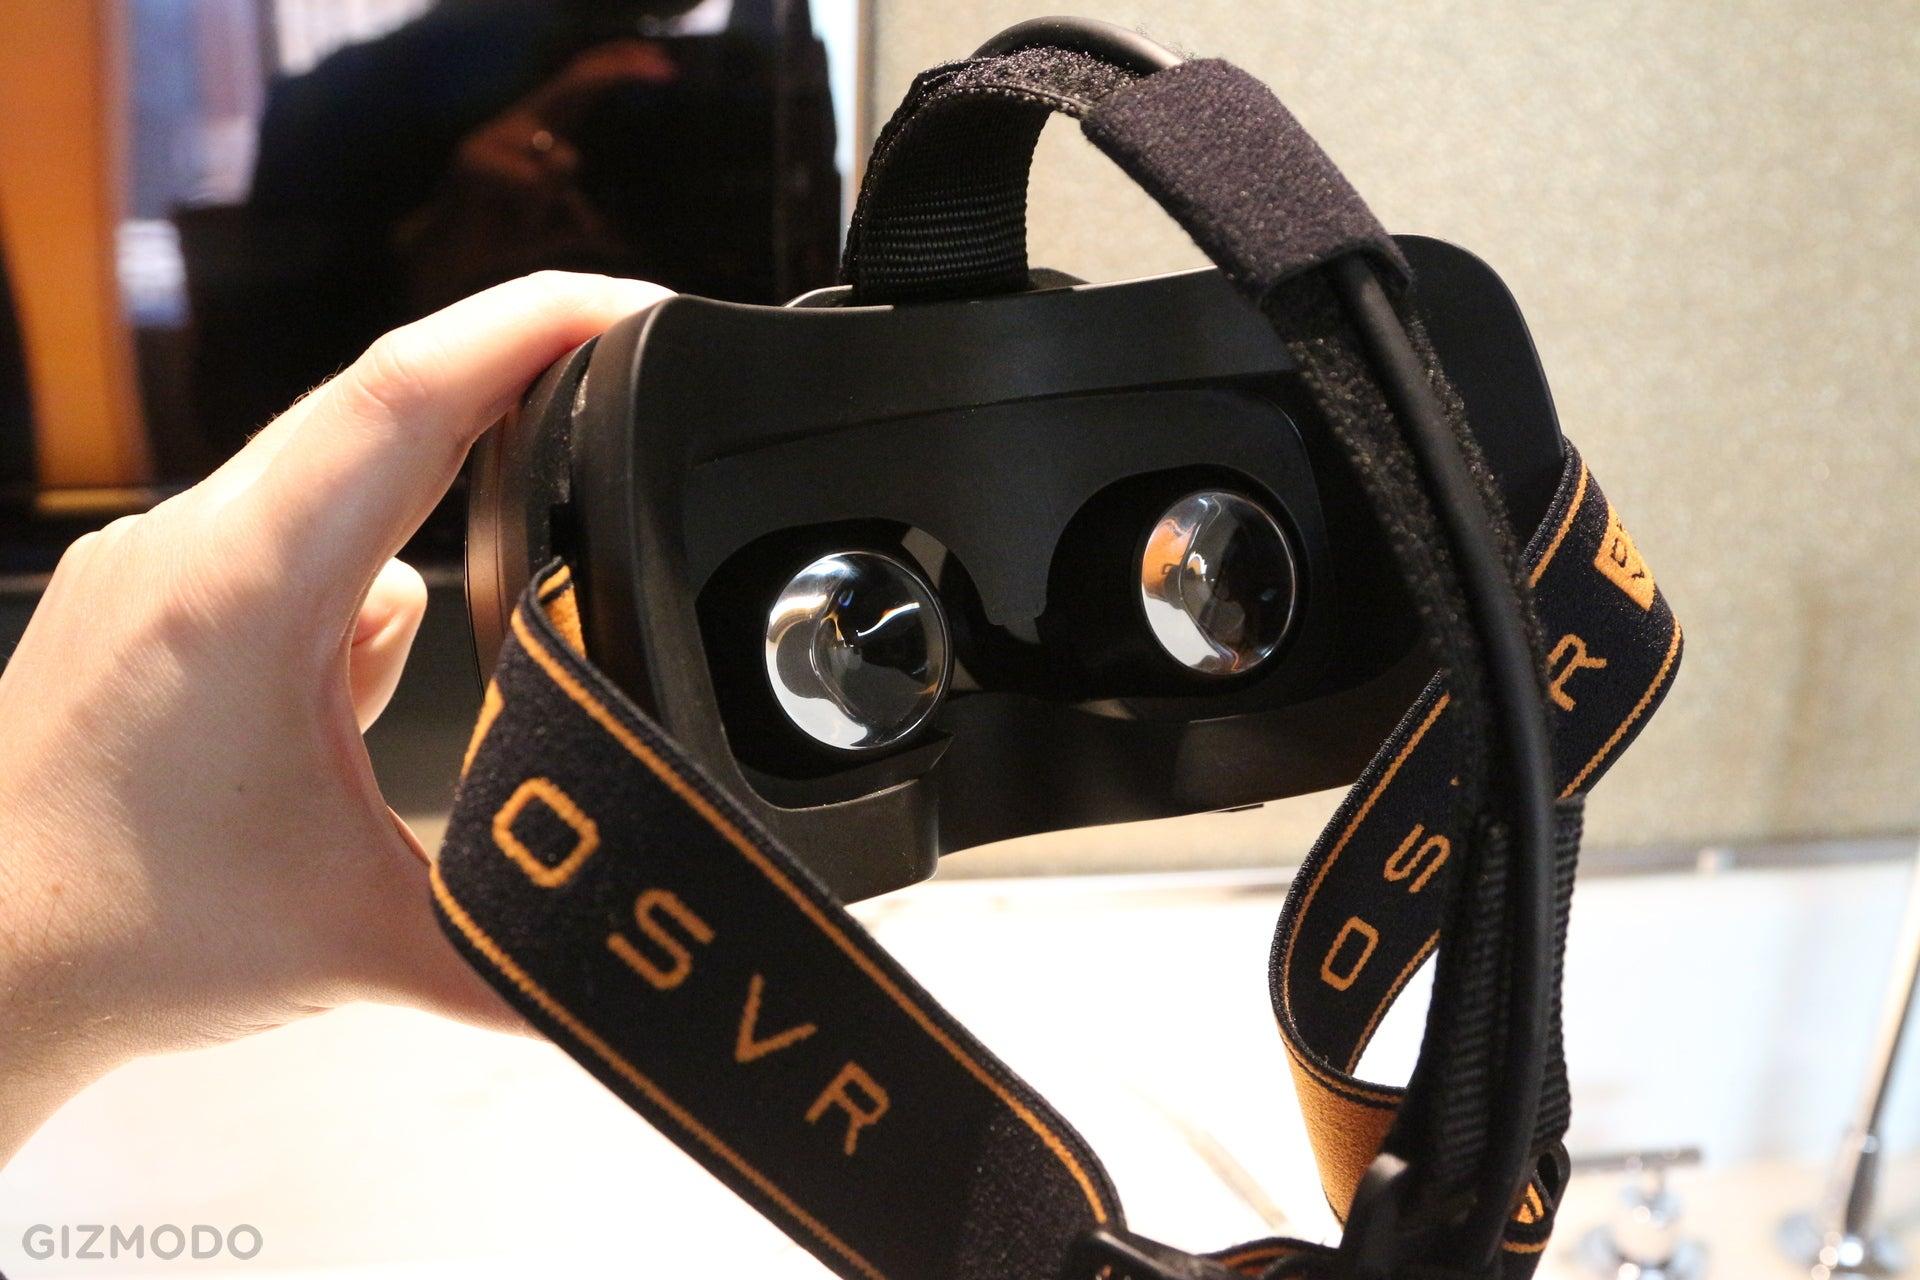 Razer Has Its Own $US200 Virtual Reality Headset